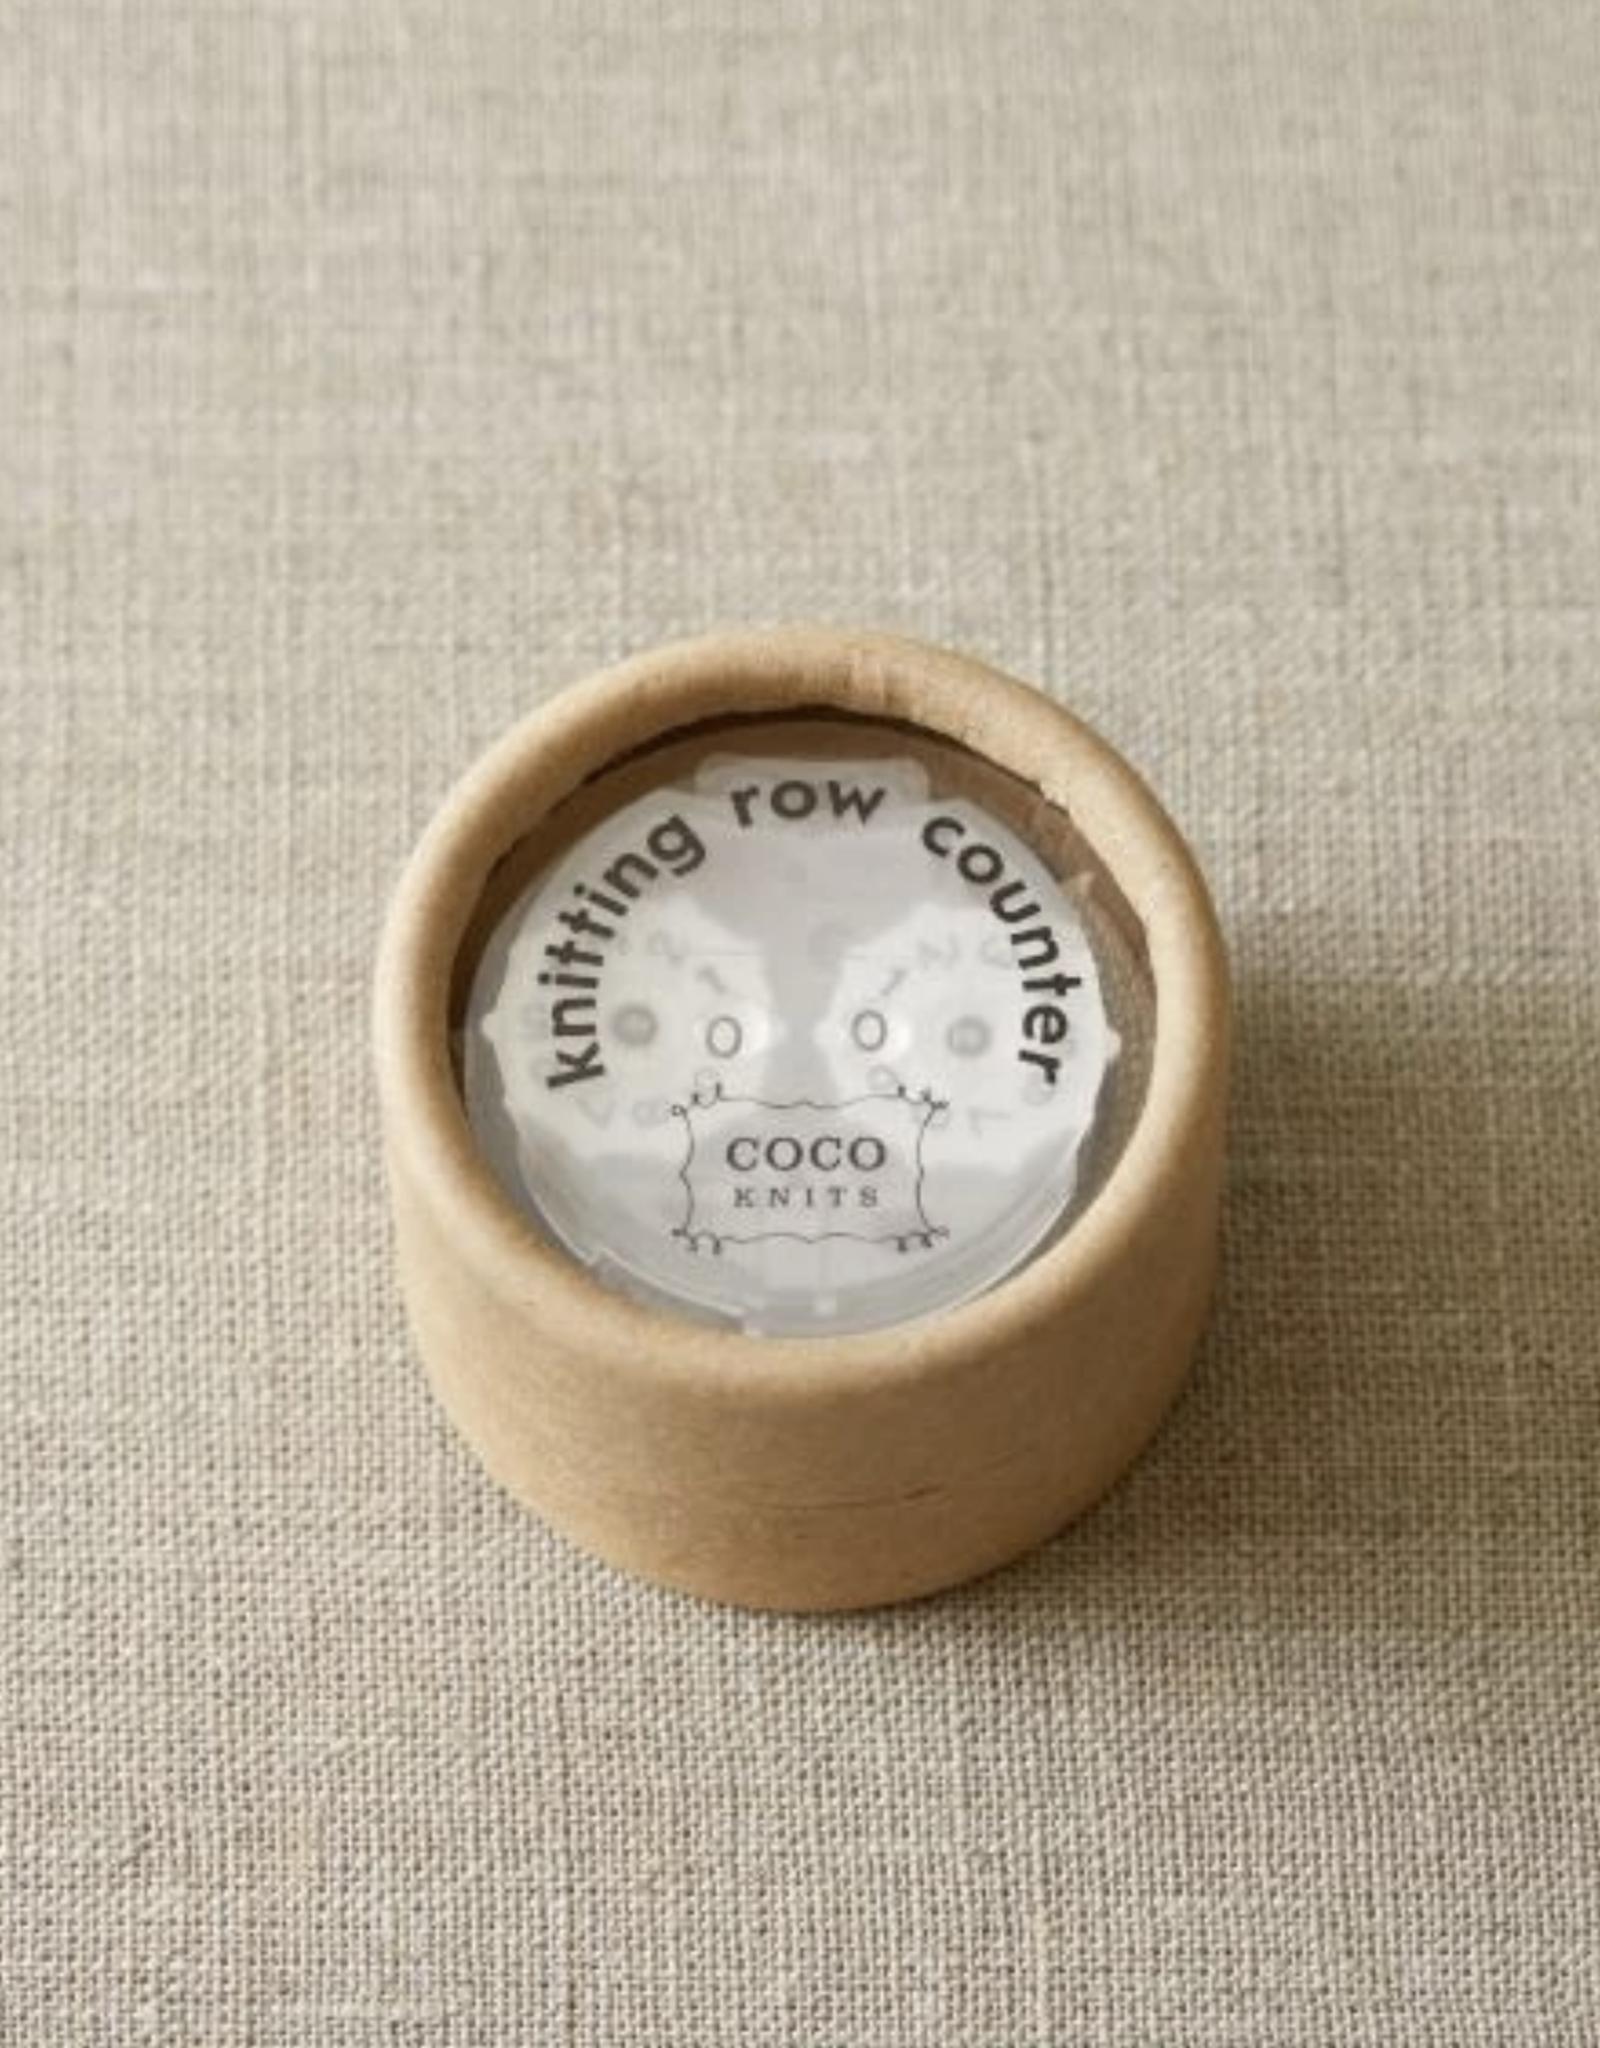 Cocoknits Knitting Row Counter